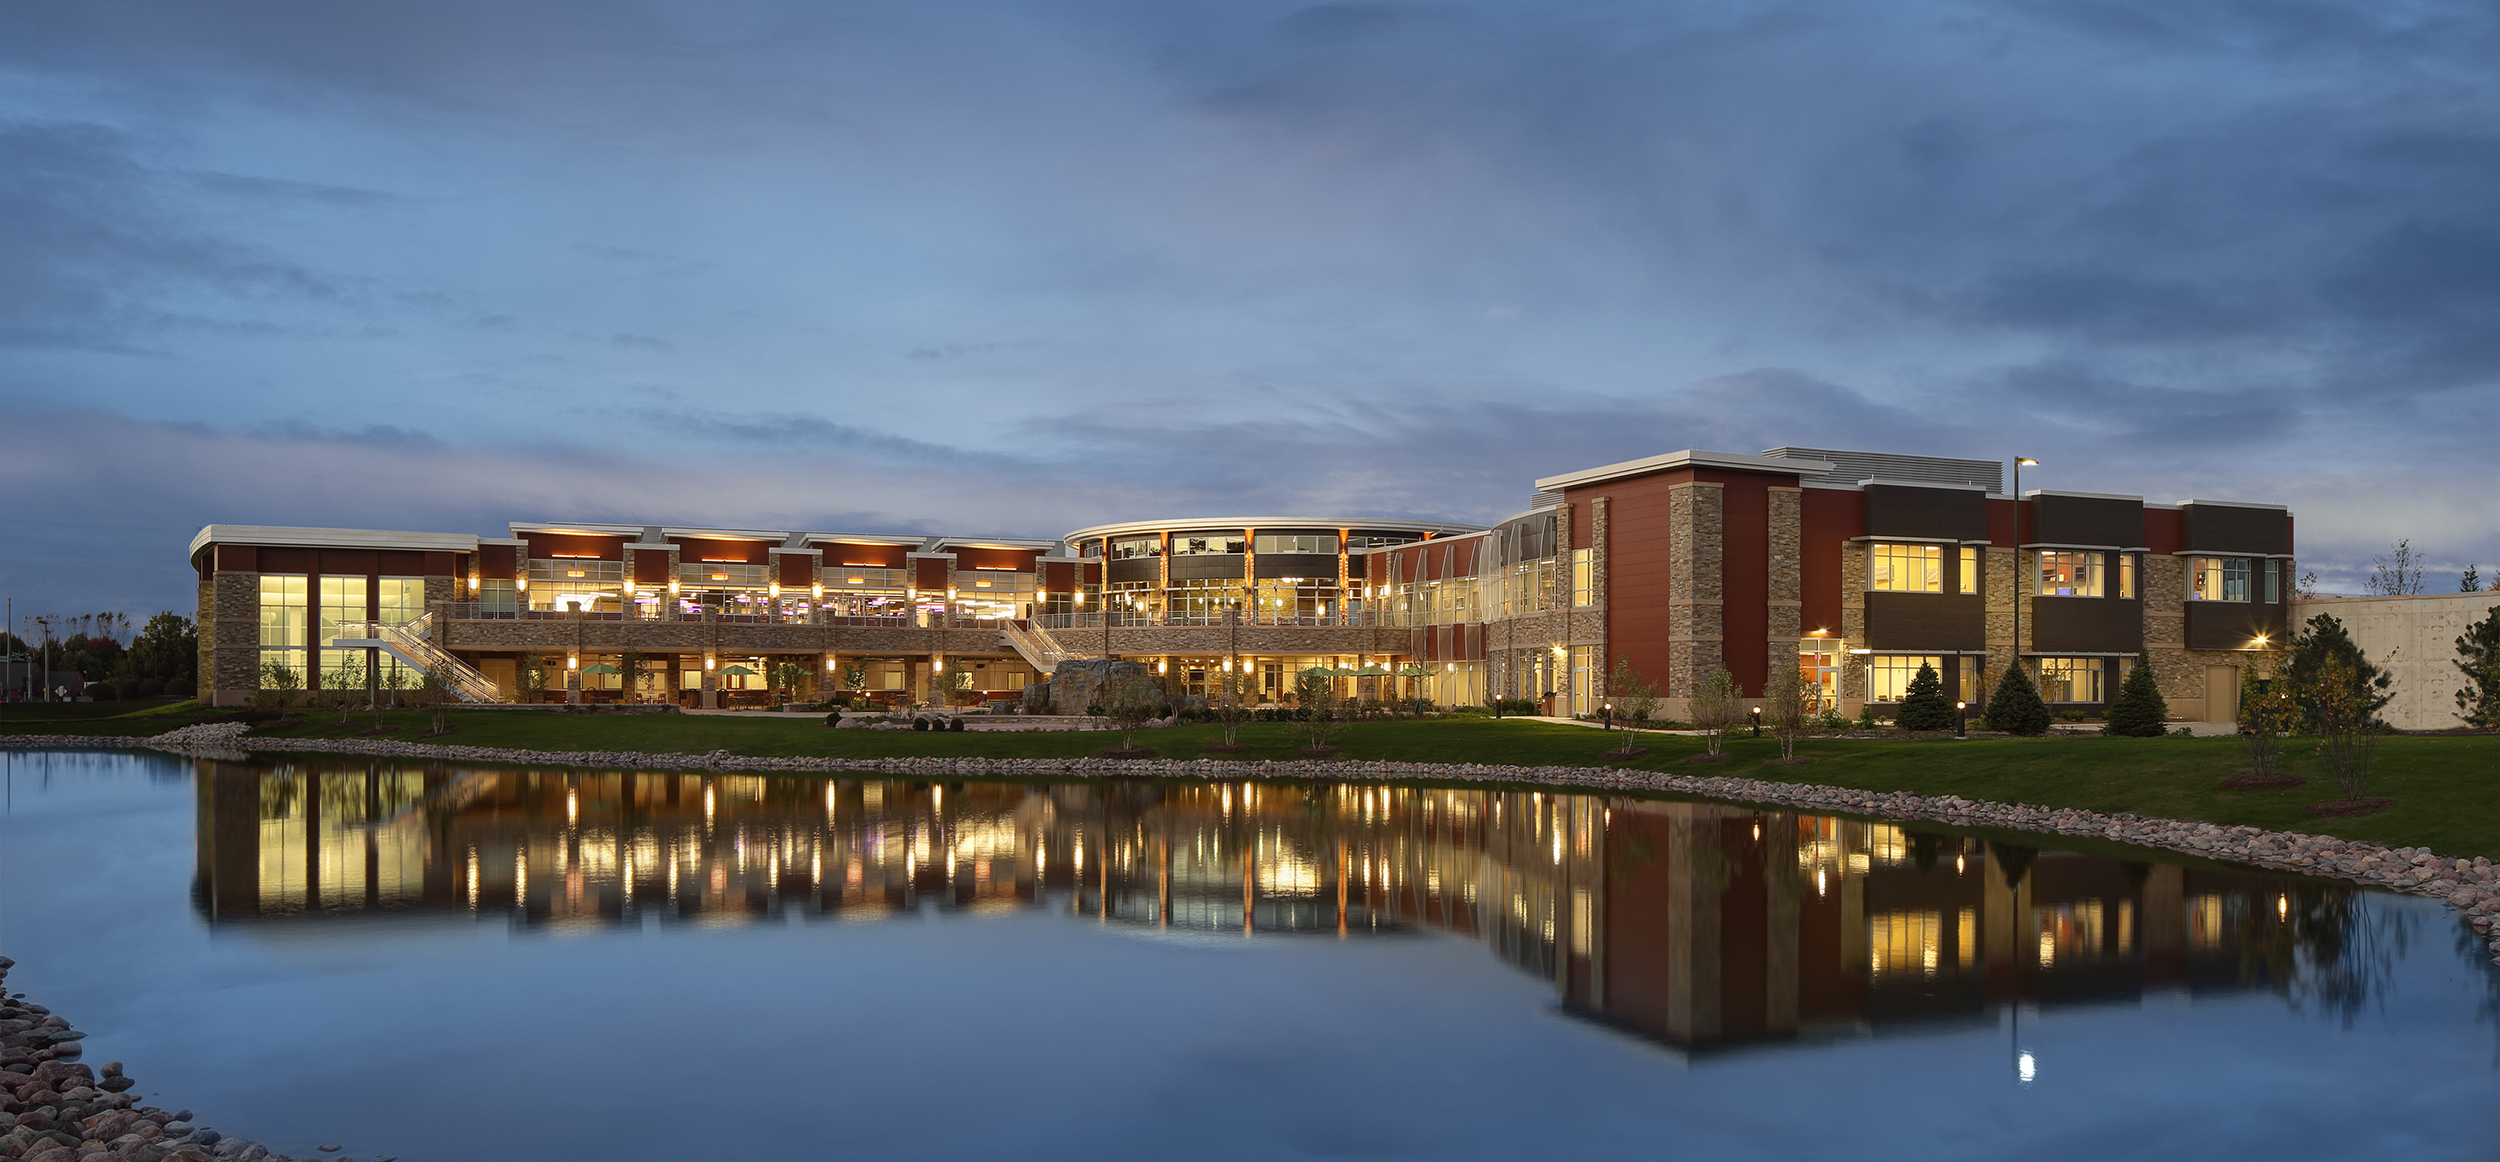 Illinois health & fitness facility exteriors photography